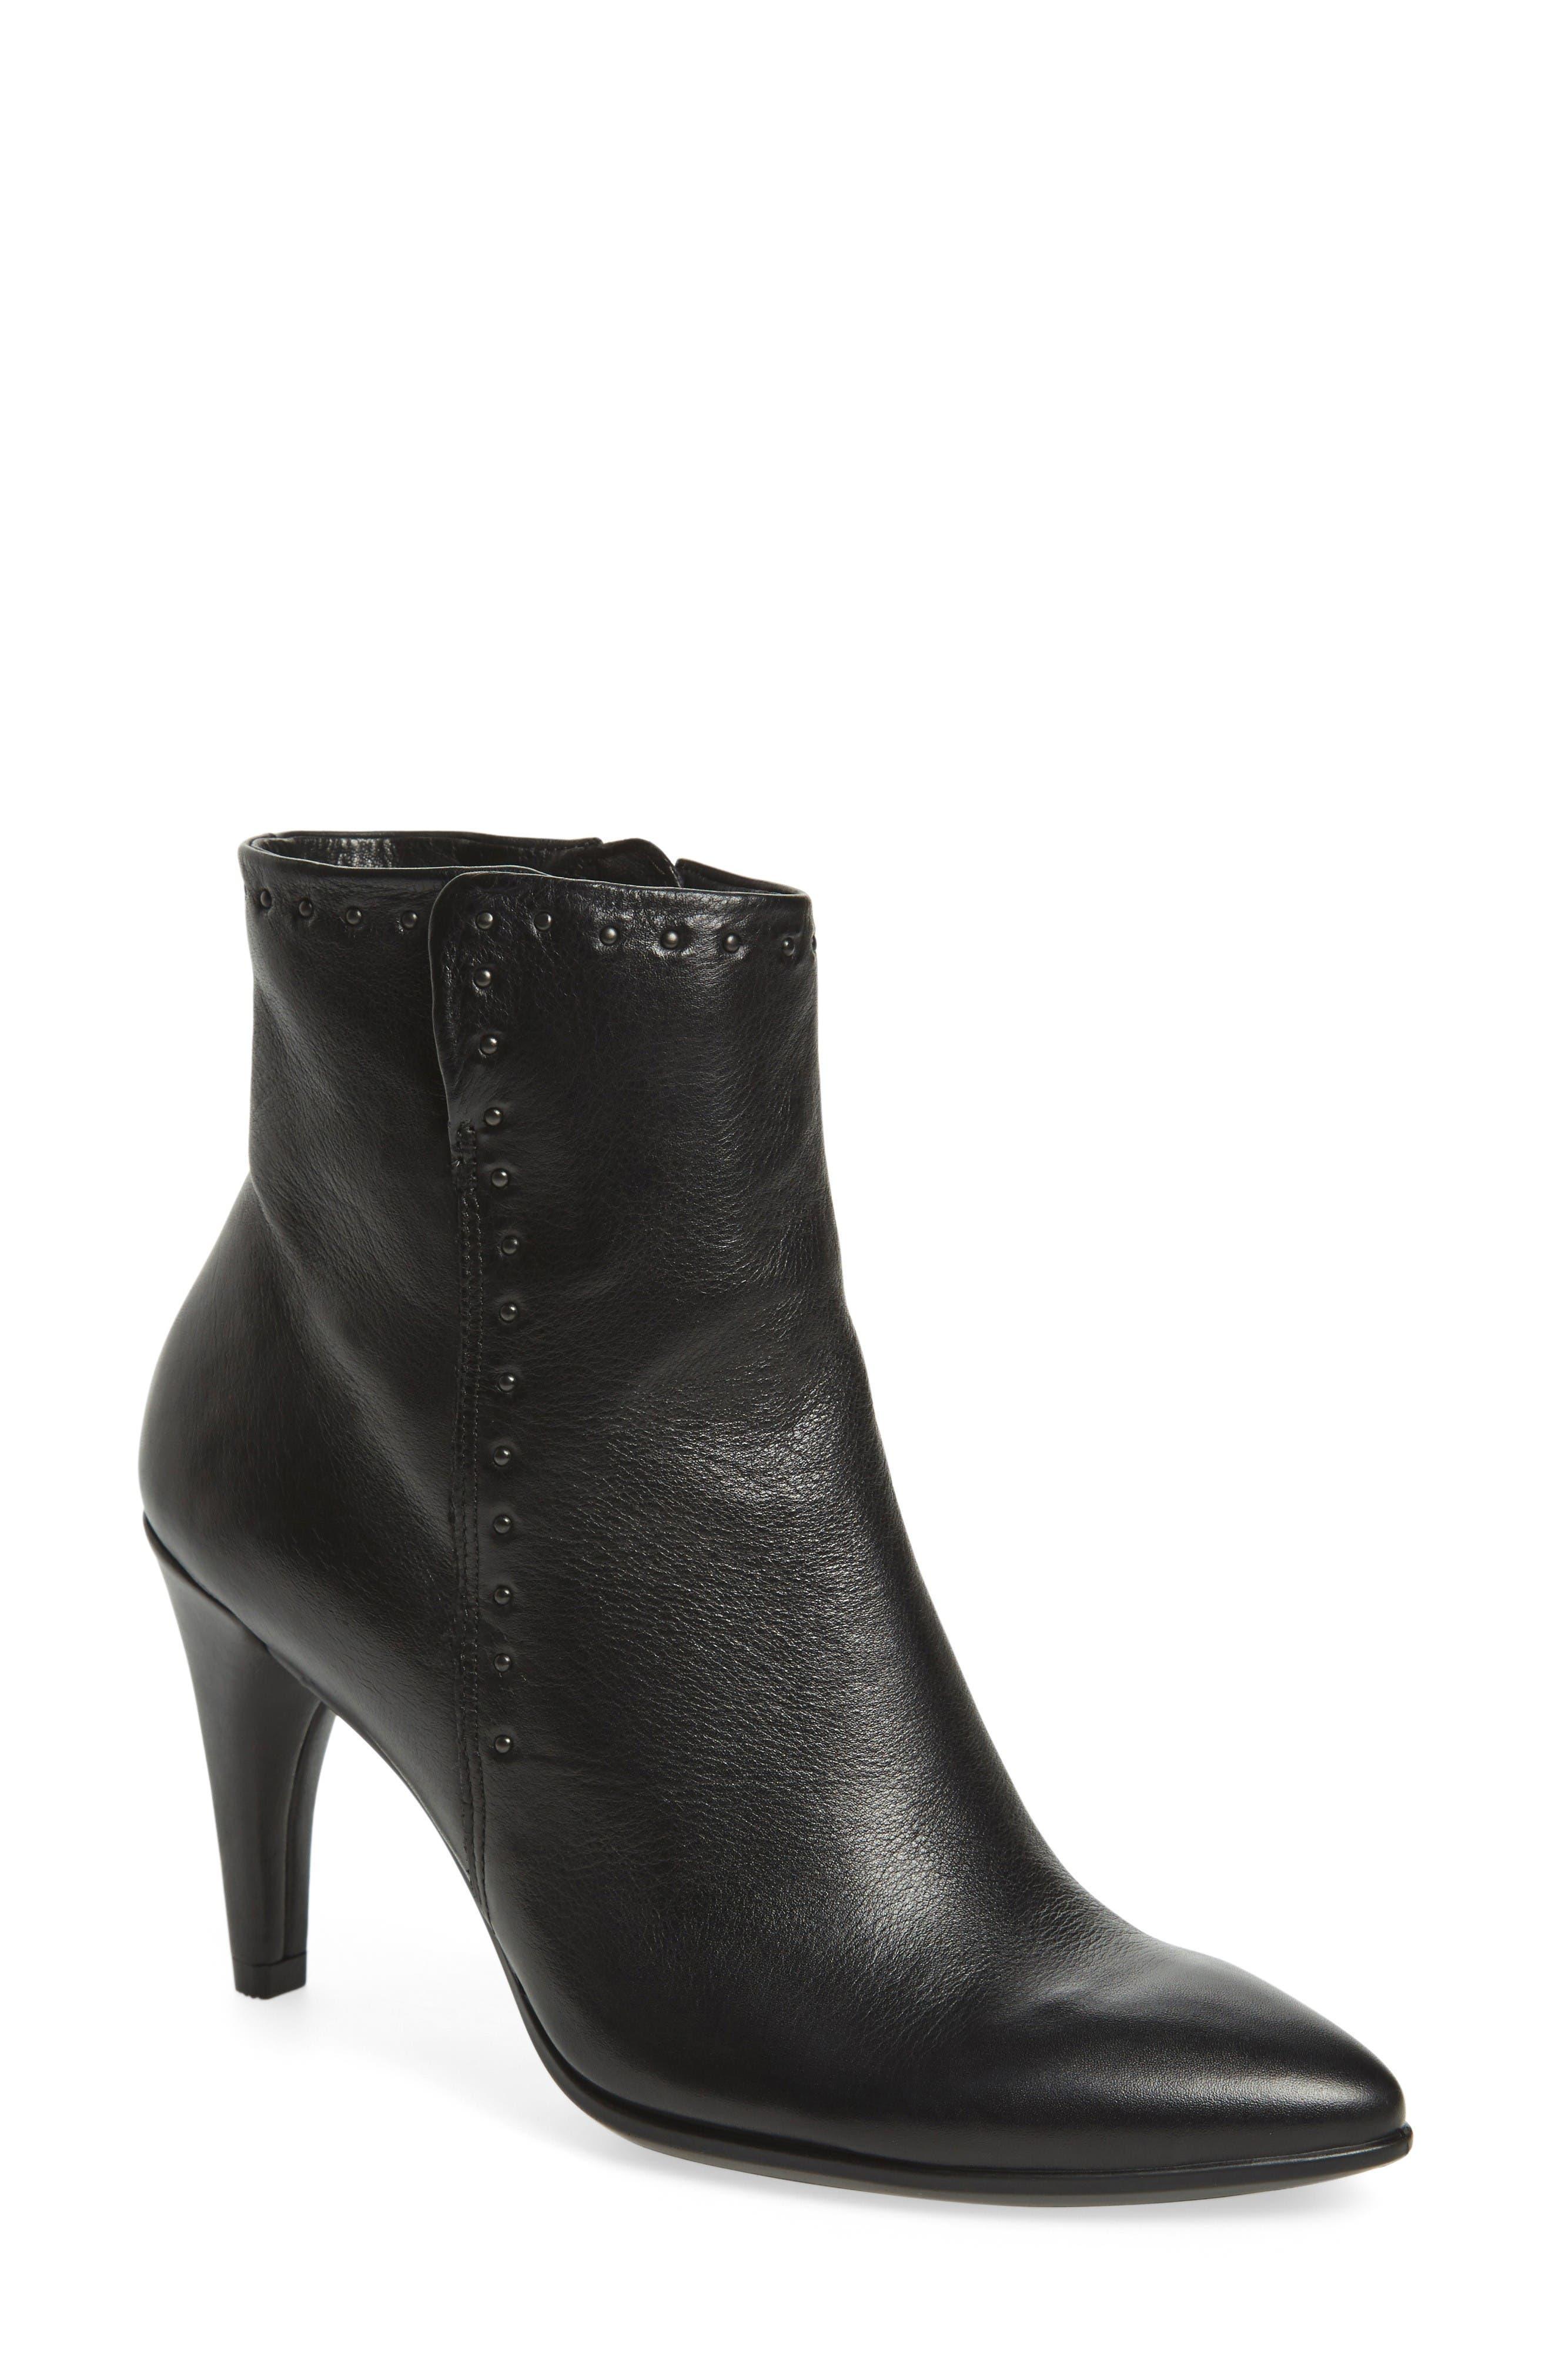 Main Image - ECCO Shape 75 Rivet Ankle Boot (Women)